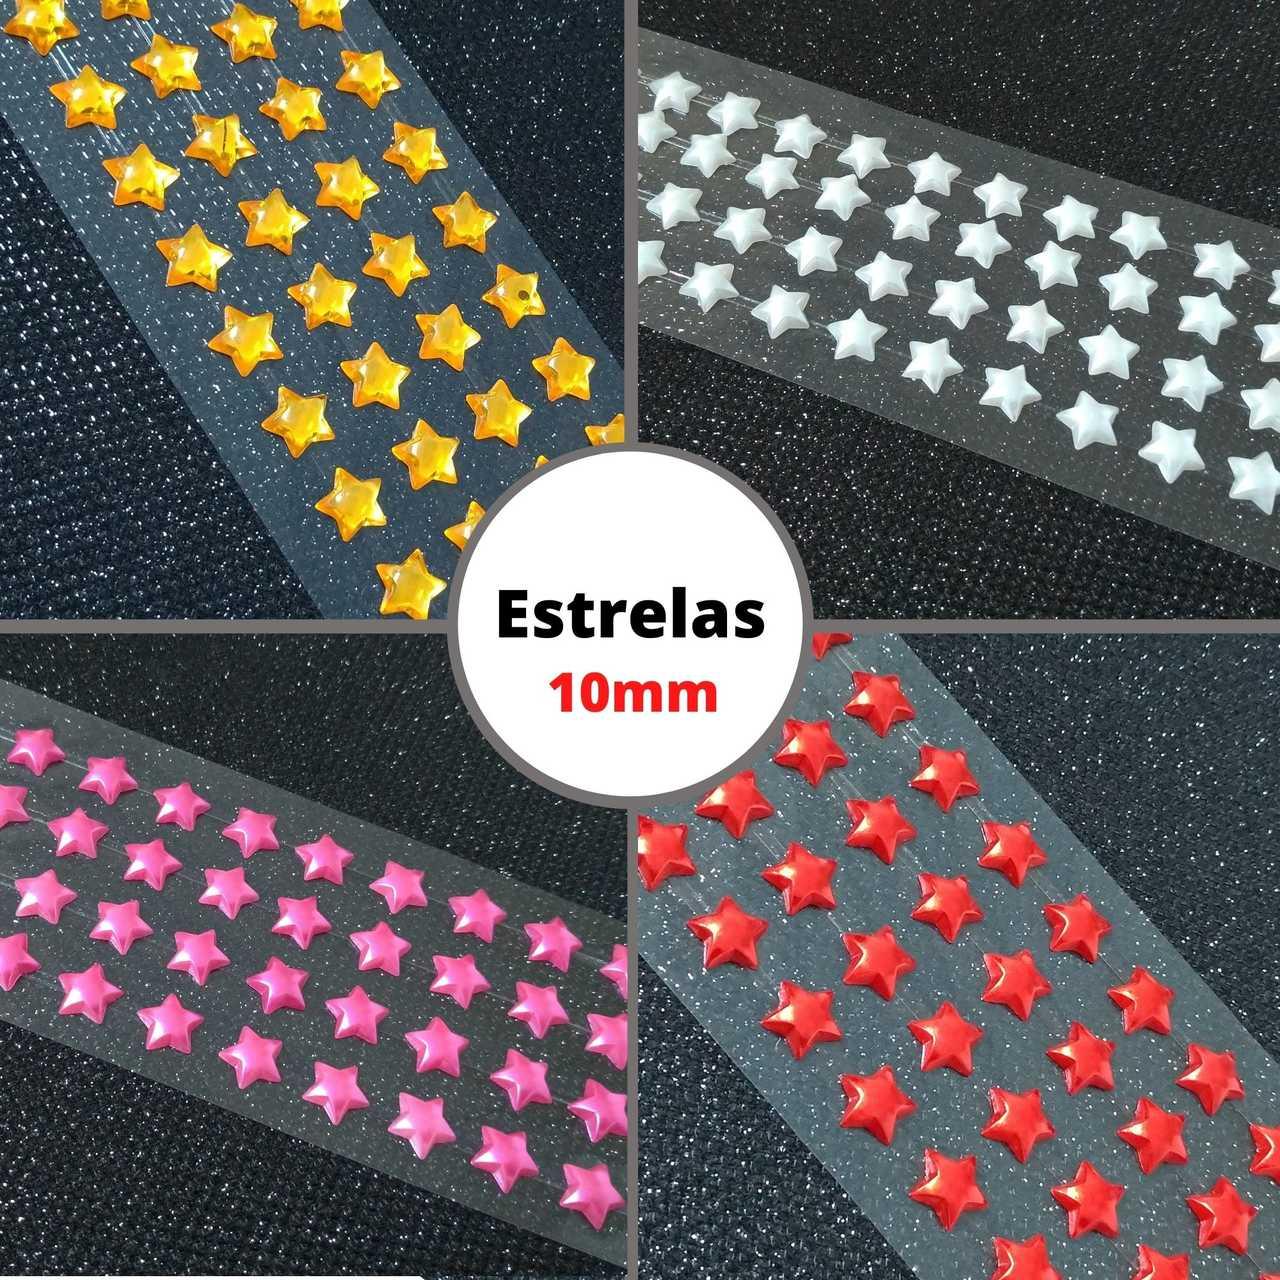 Cartela Adesiva Meia Pérola Formato Estrela - 1 cartela